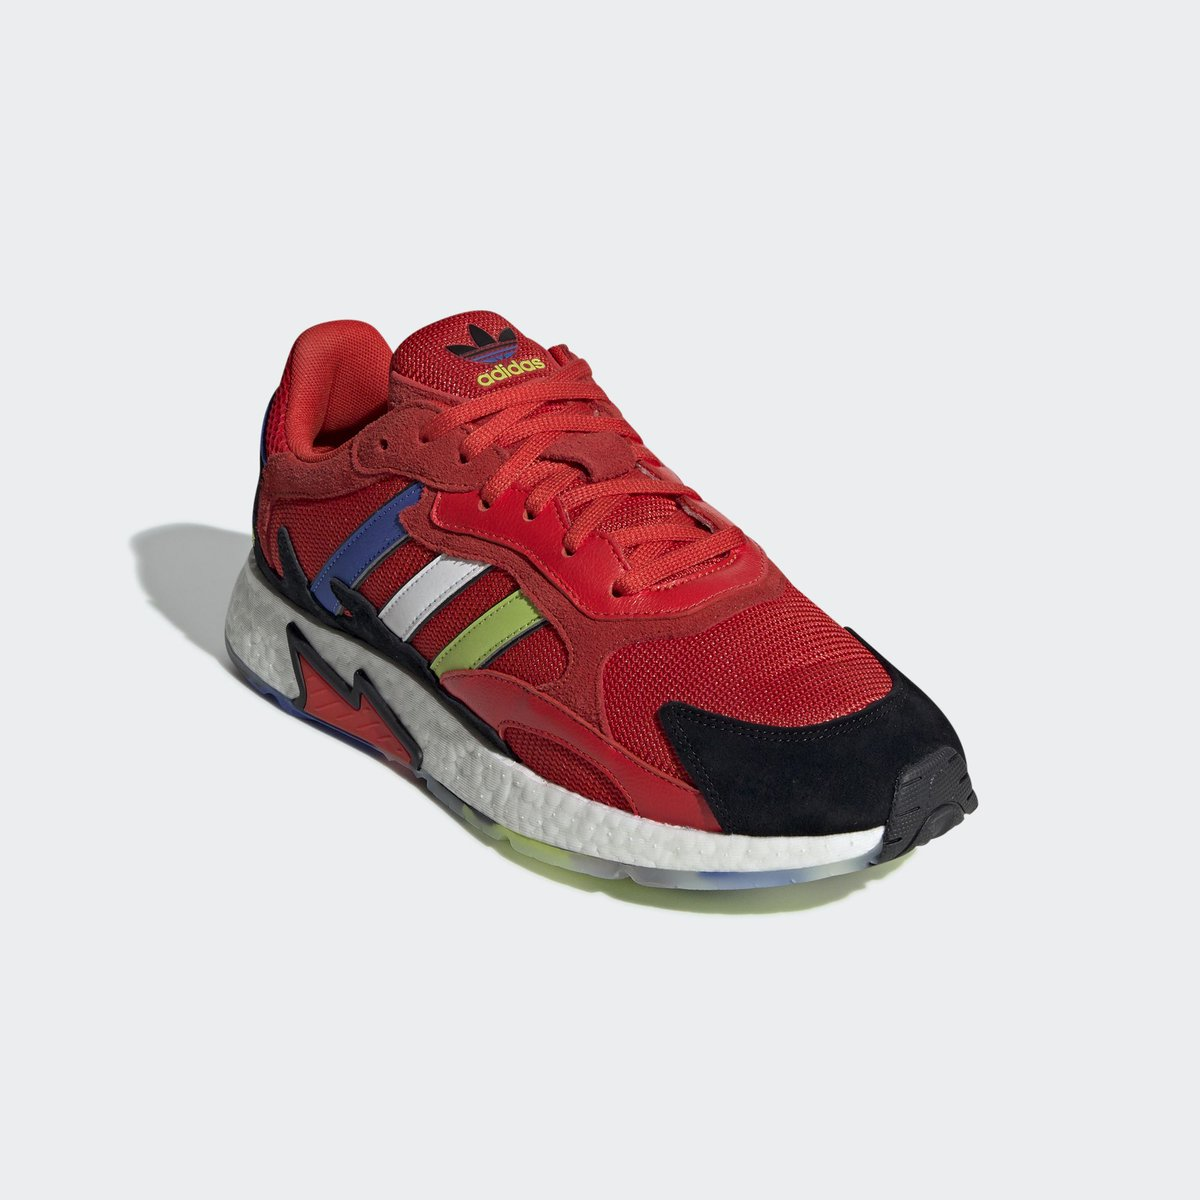 adidas sportswear collective